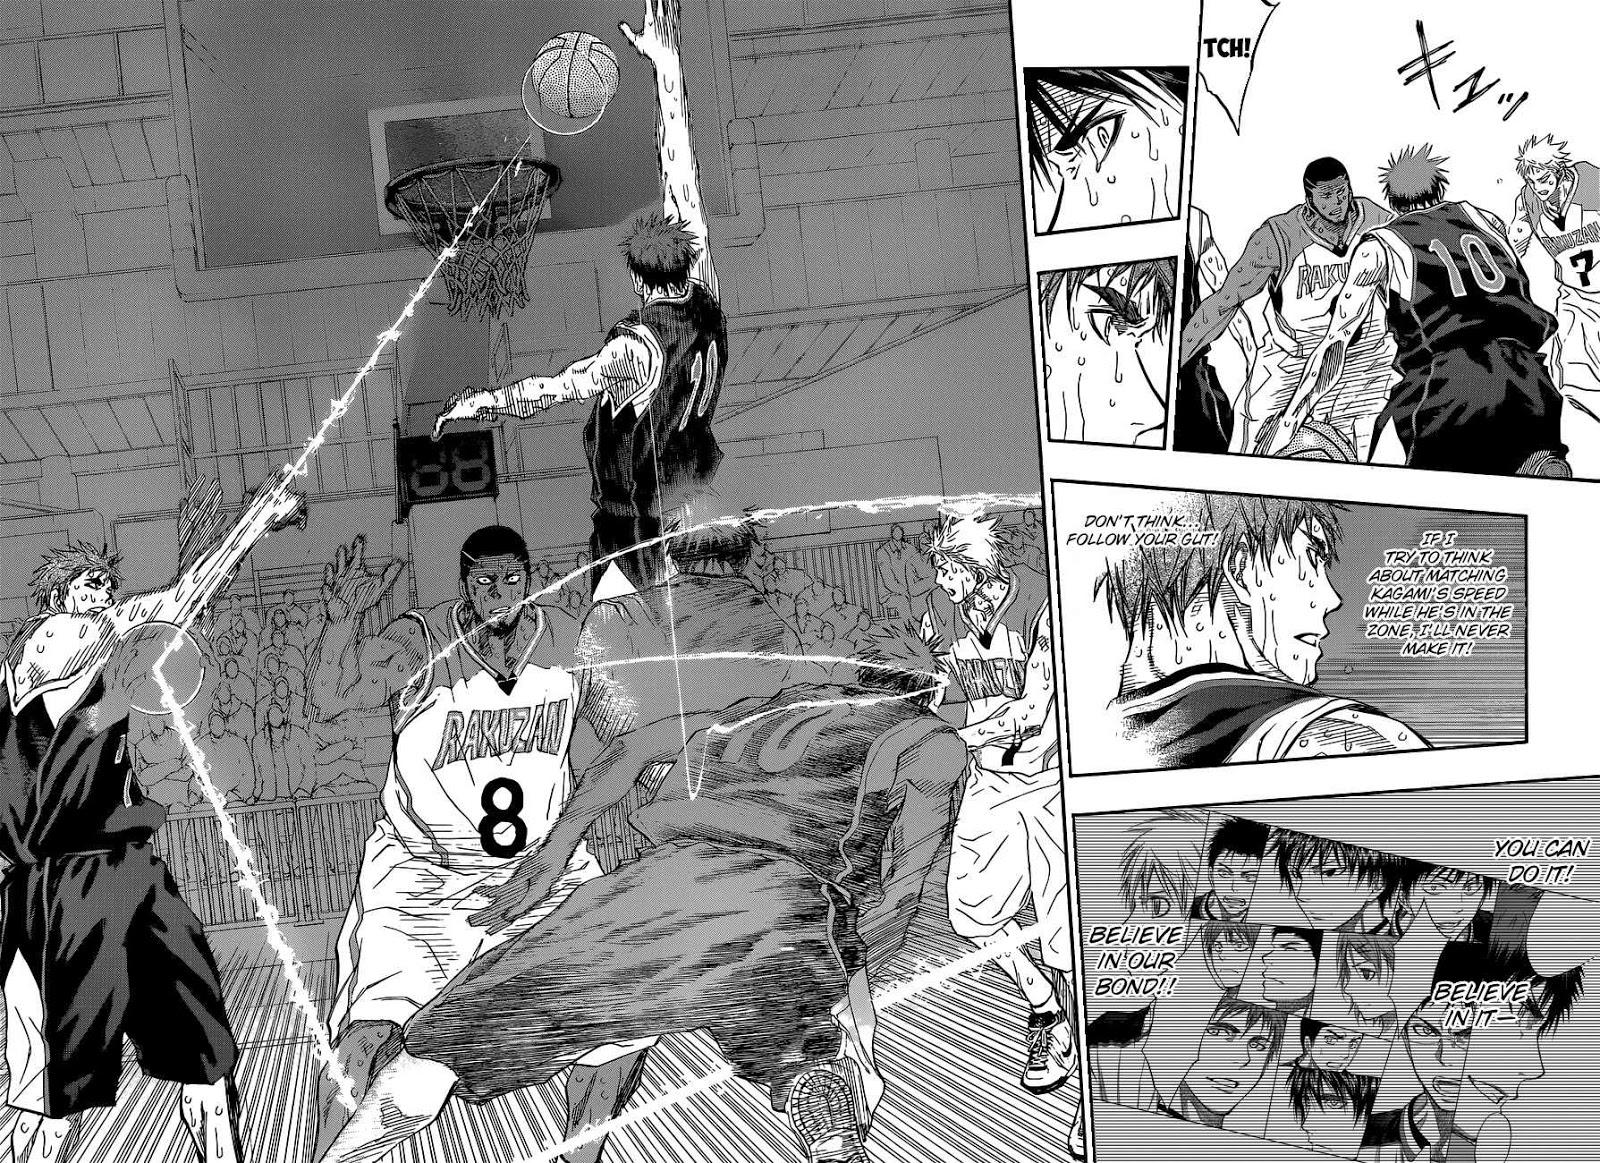 Kuroko no Basket Manga Chapter 271 - Image 02-03